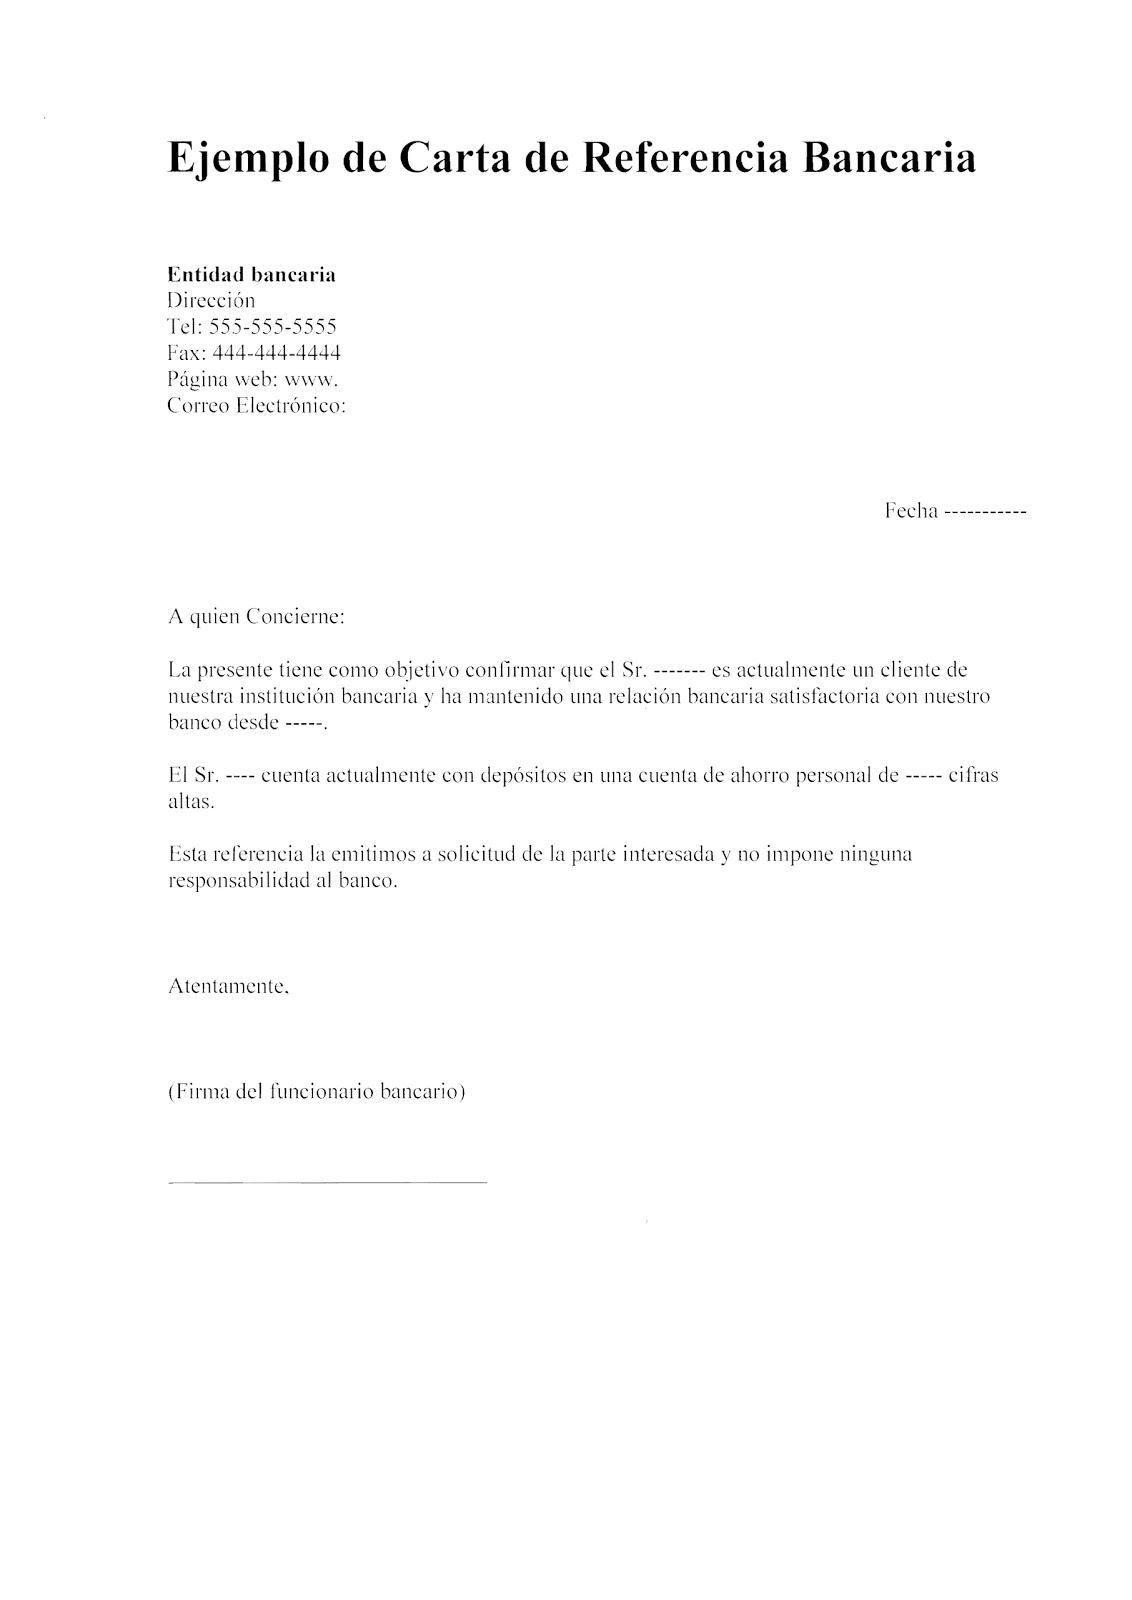 modelo de carta de referencia personal